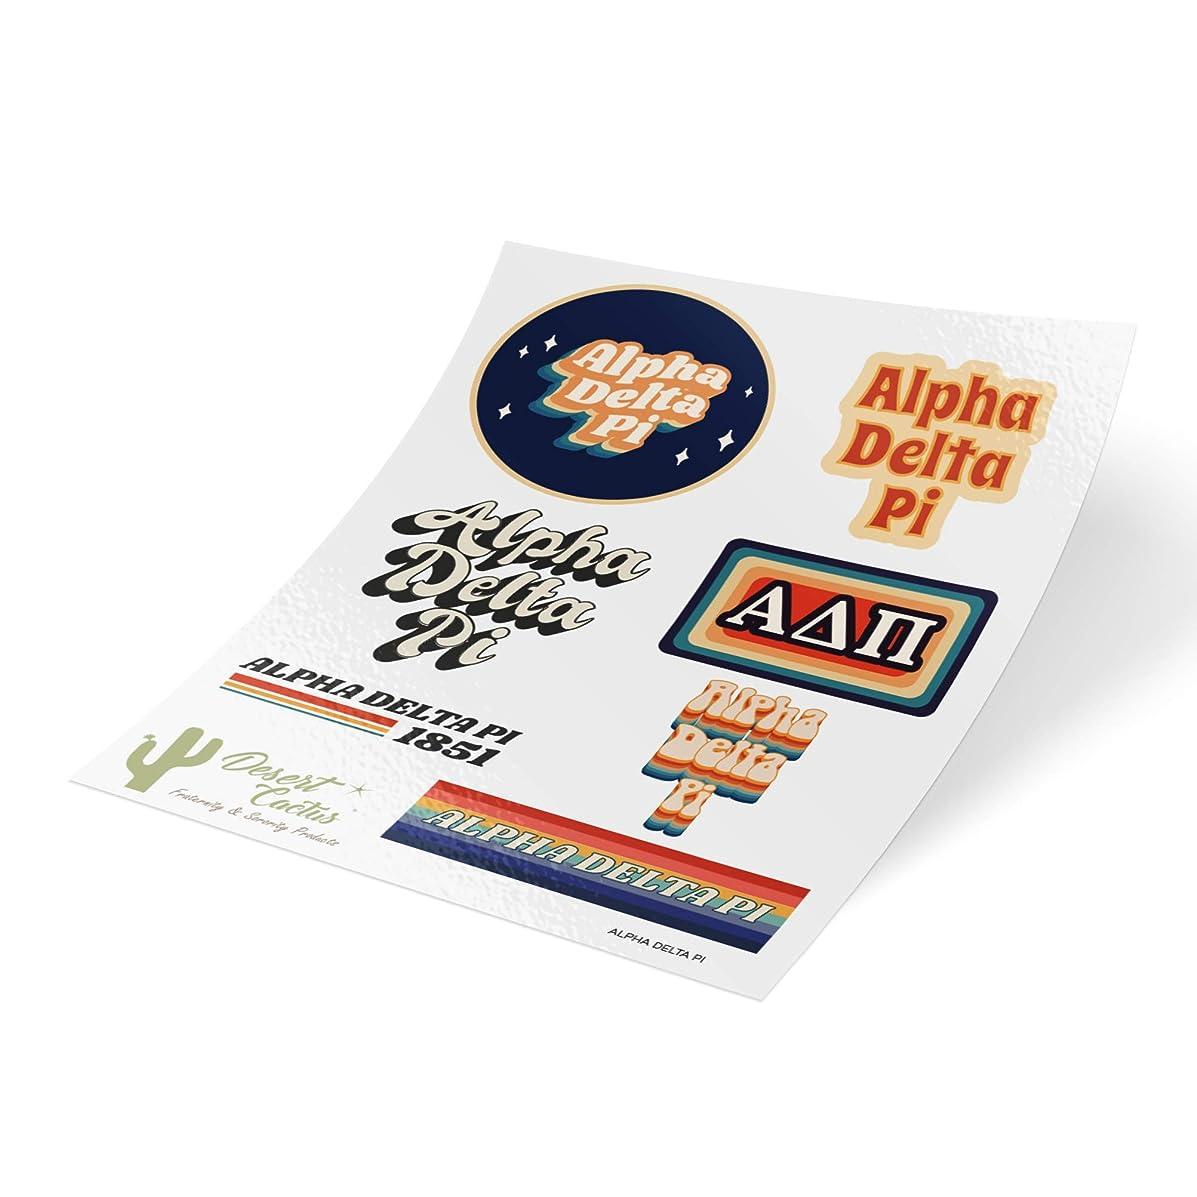 Alpha Delta Pi 70's Themed Sticker Sheet Decal Laptop Water Bottle Car ADPi (Full Sheet - 70's)